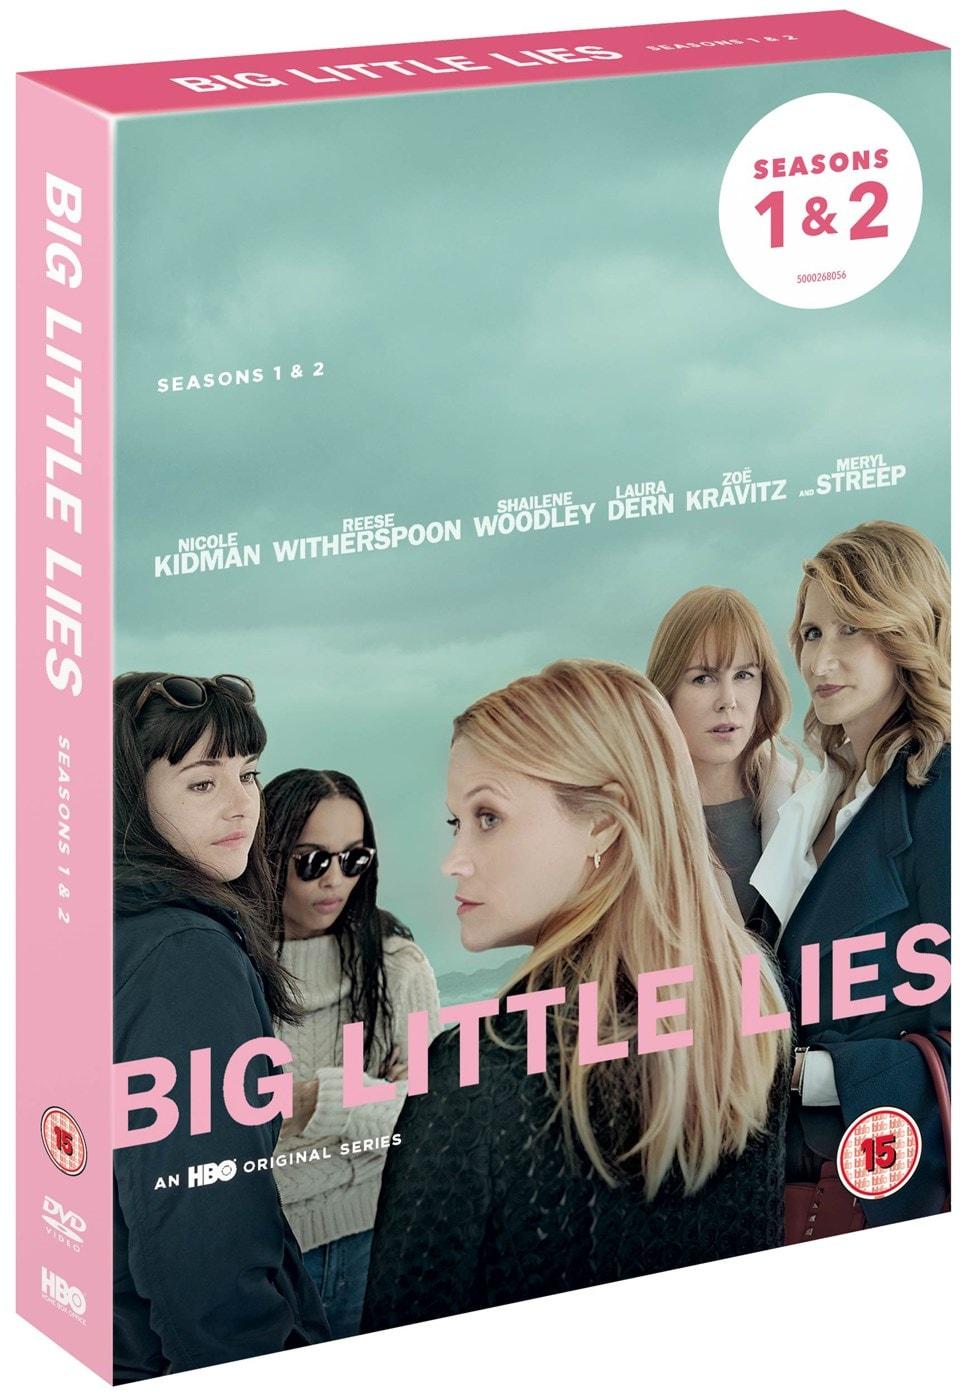 Big Little Lies: Seasons 1 & 2 - 2